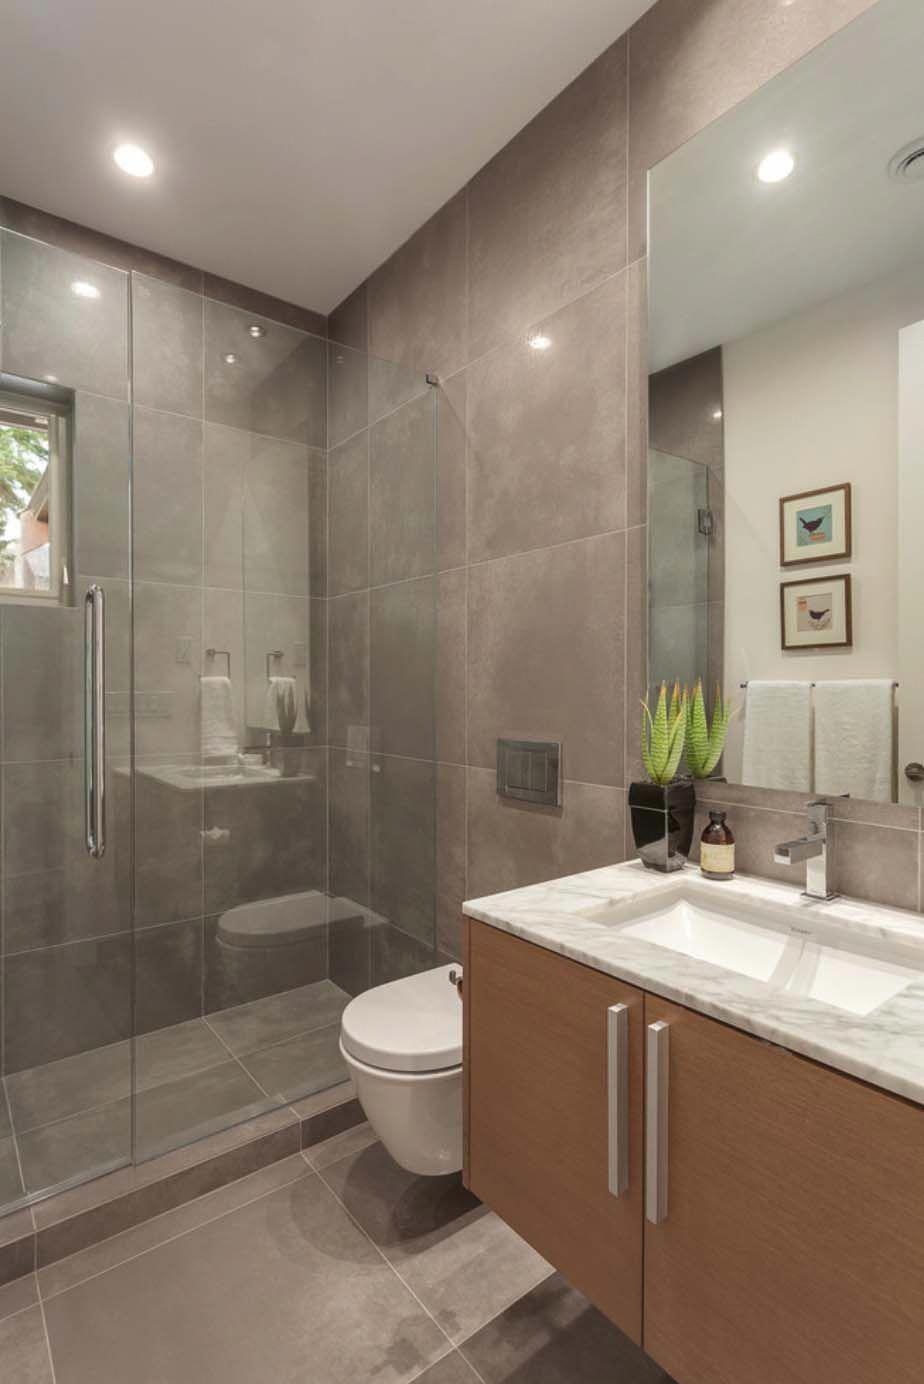 Modernes badezimmerdekor 2018 lightflooded contemporary style residence in west vancouver